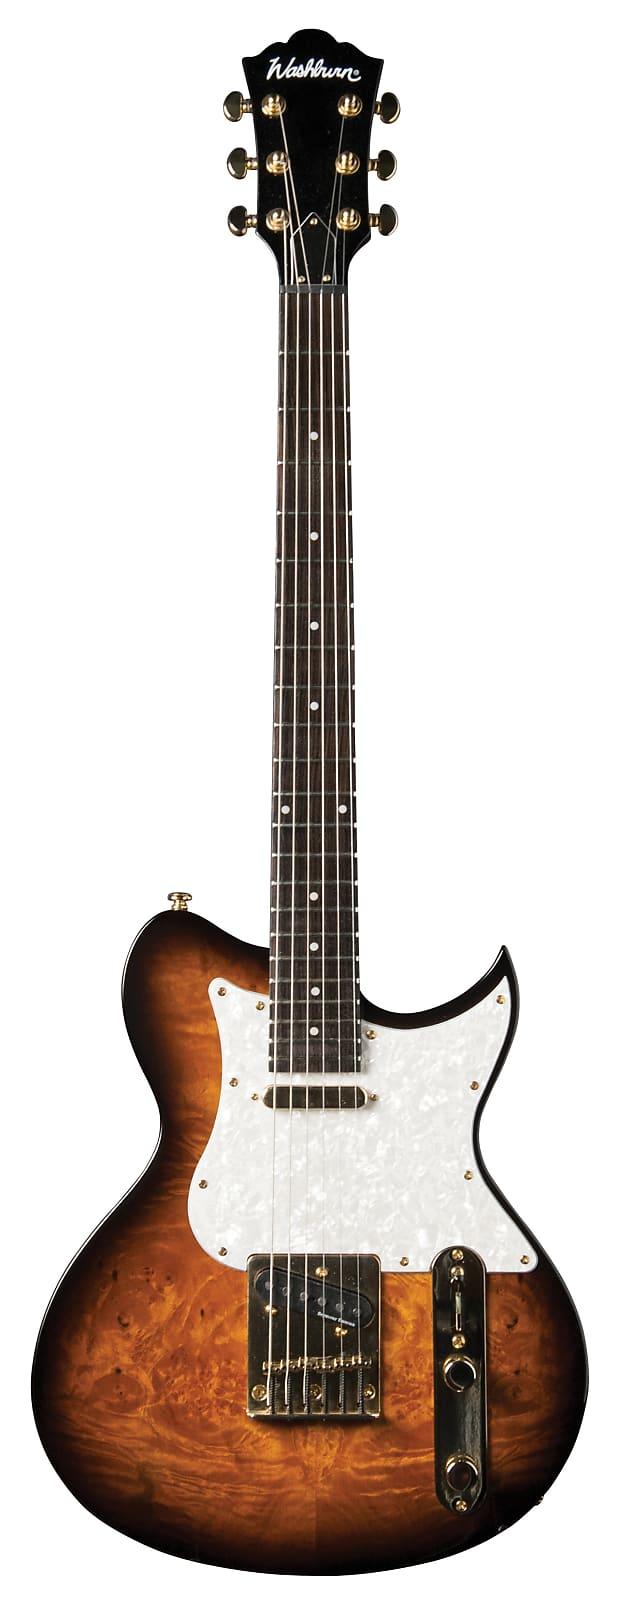 Washburn Idol T16 Burled Maple Top Singlecut Vintage Sunburst w/ Seymour Duncan